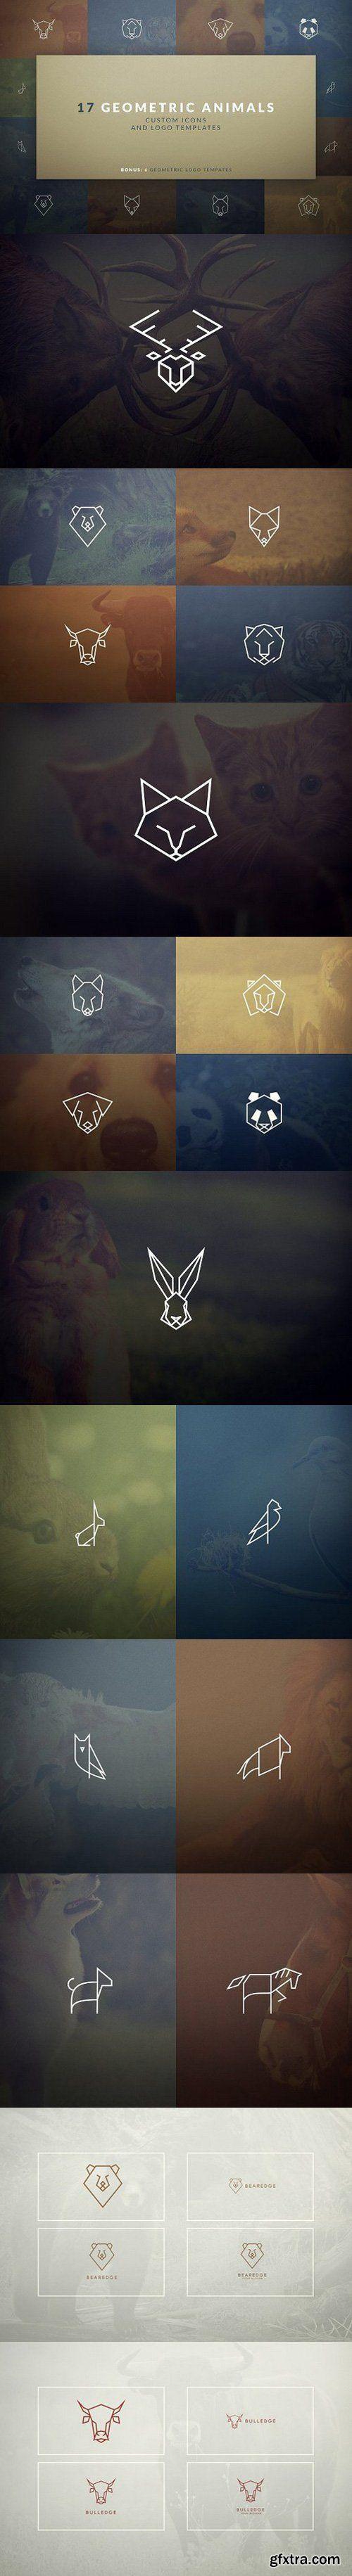 CM - 17 Geometric Animal Icons and Logos 1585900